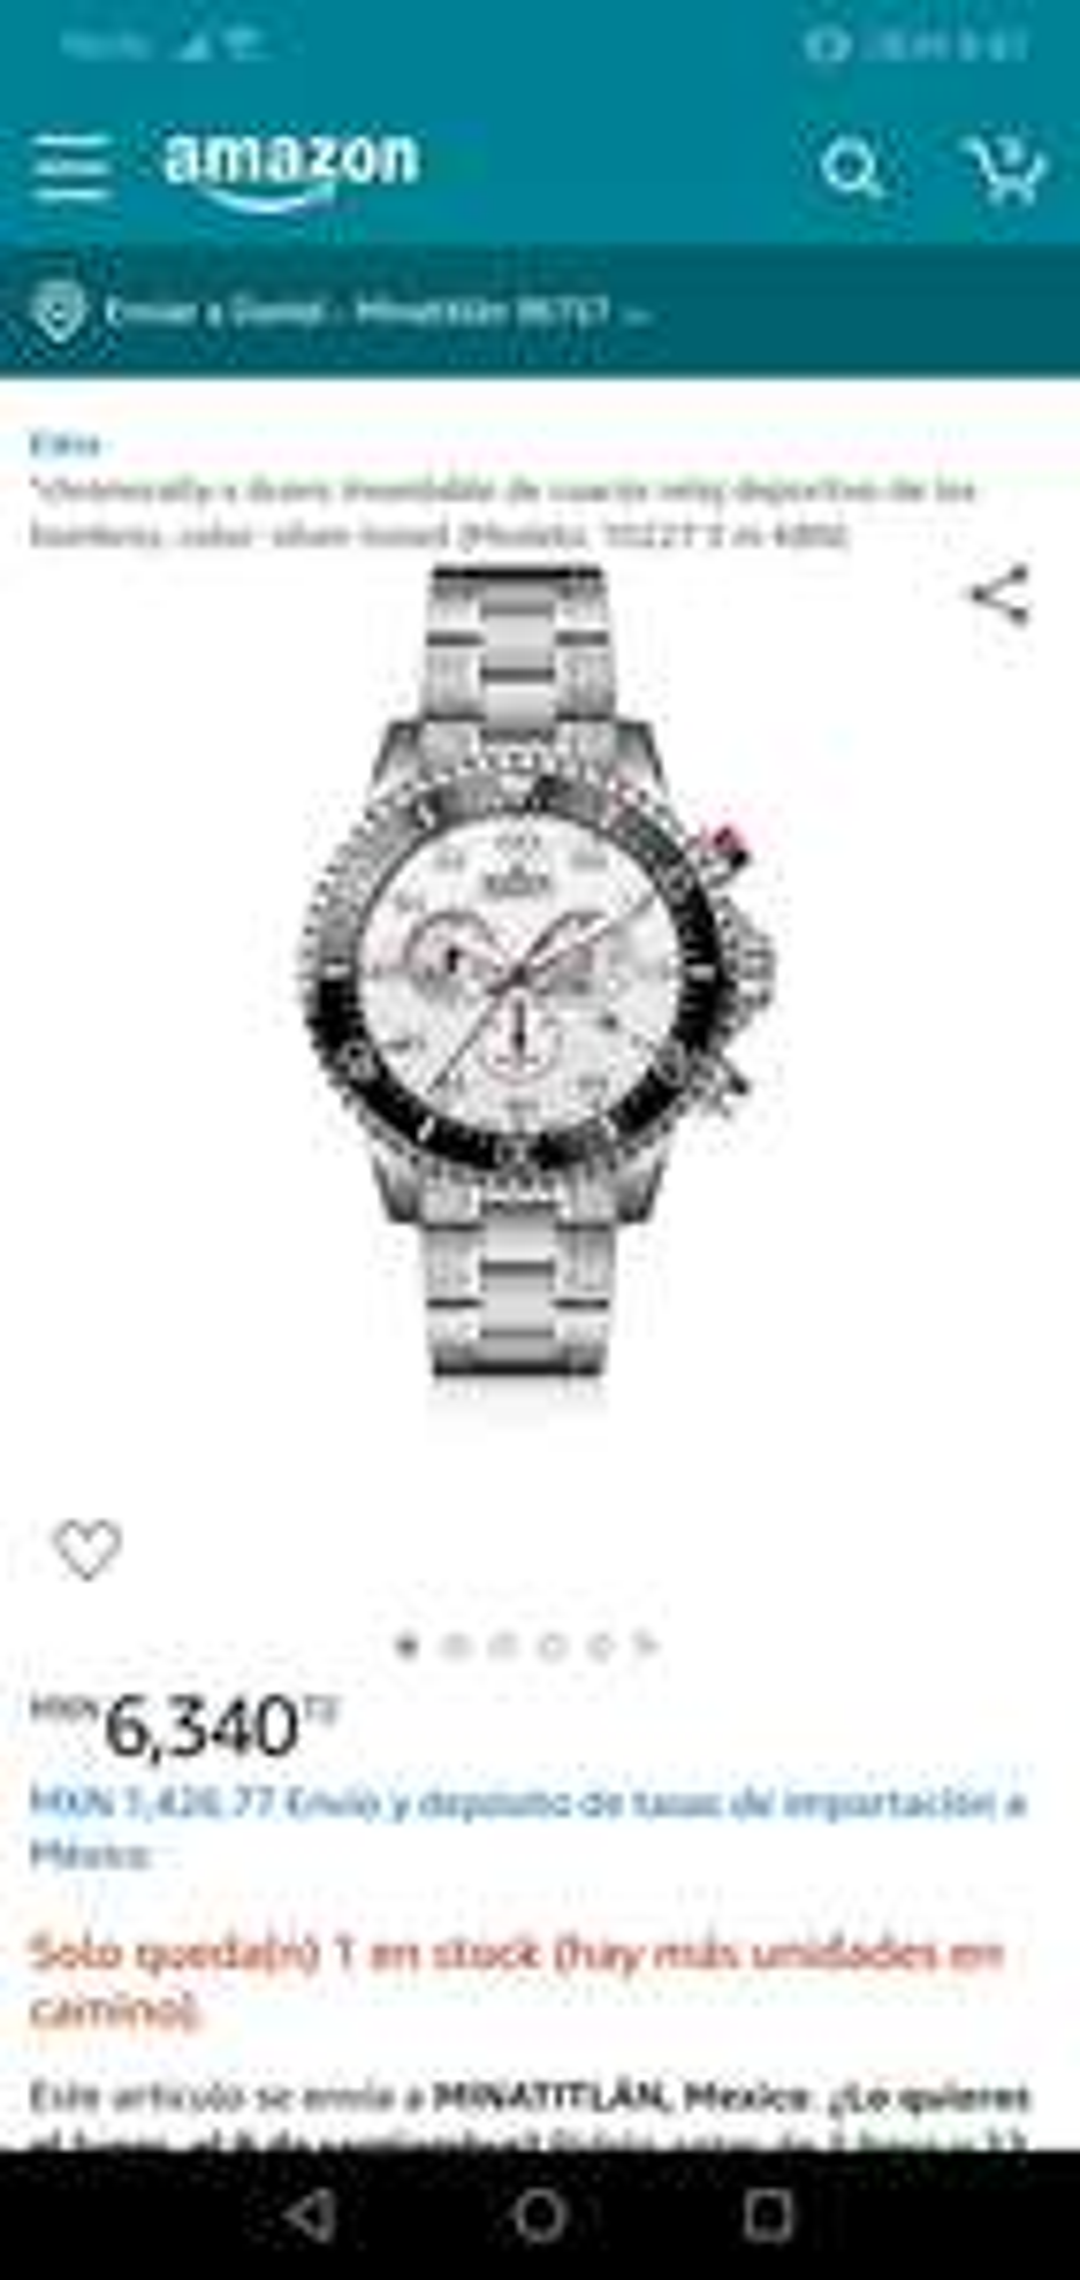 Amazon us: Oferta relojes edox